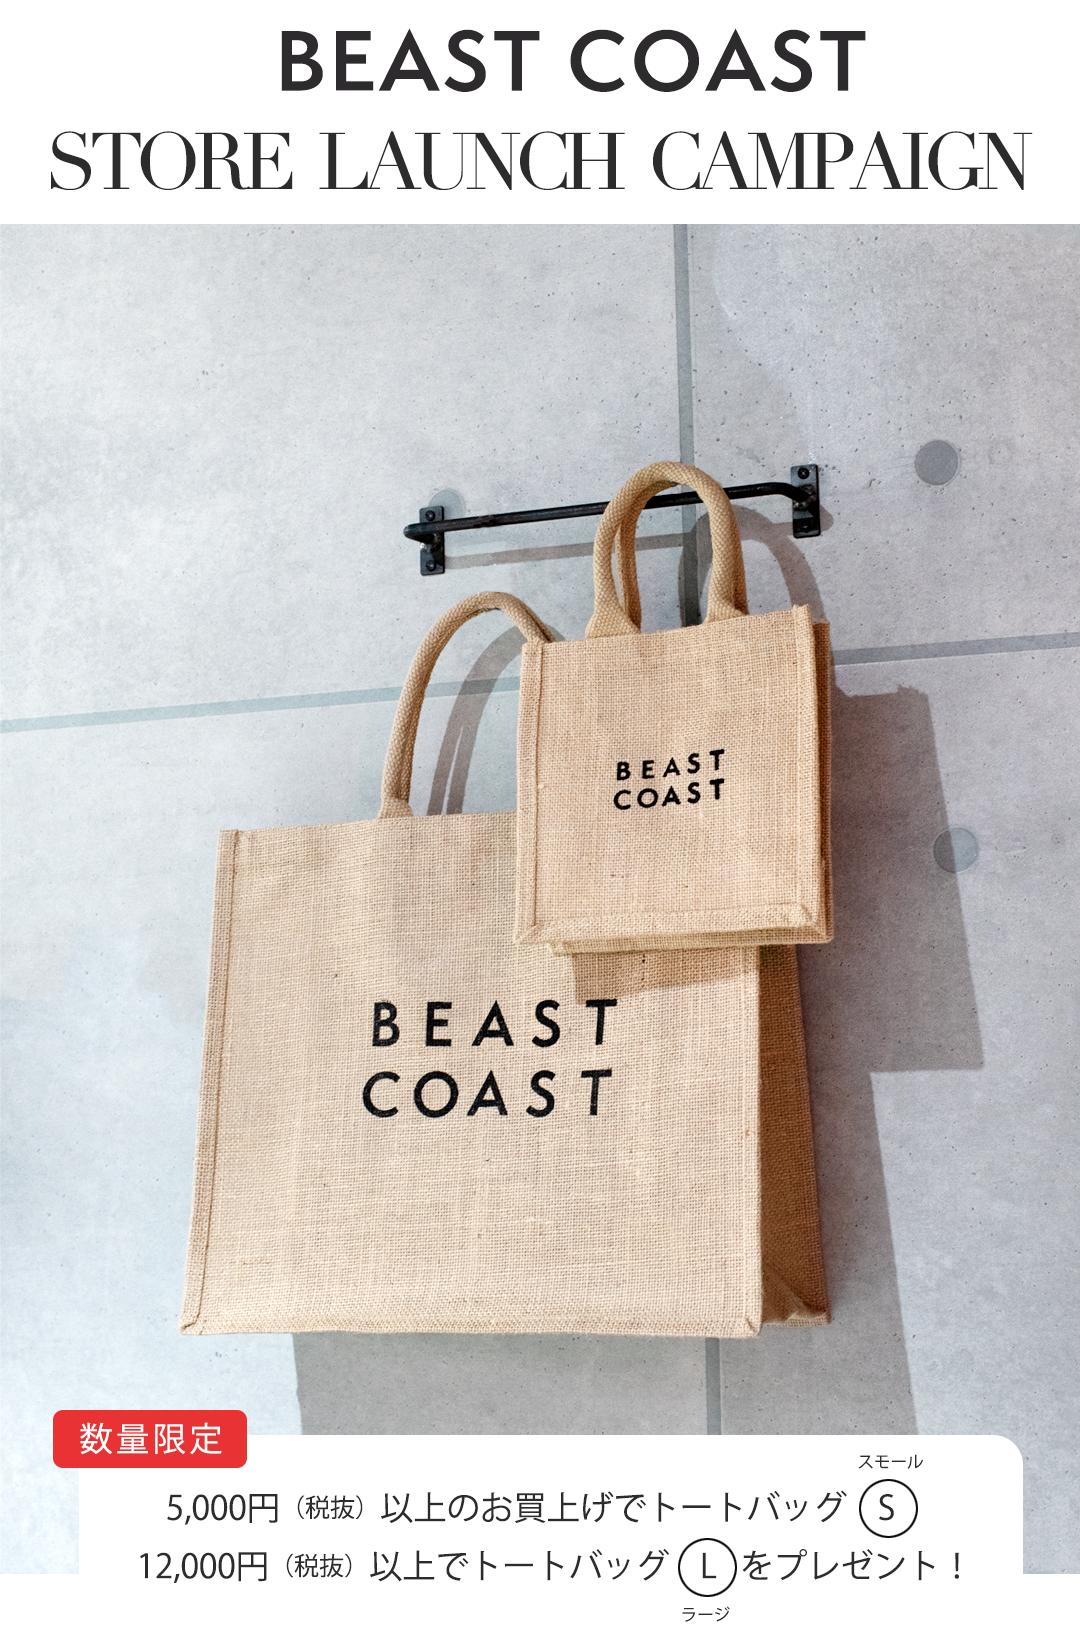 「BEAST COAST(ビーストコースト)」新店舗オープン記念キャンペーン!オリジナルジュート製トートバッグをプレゼント